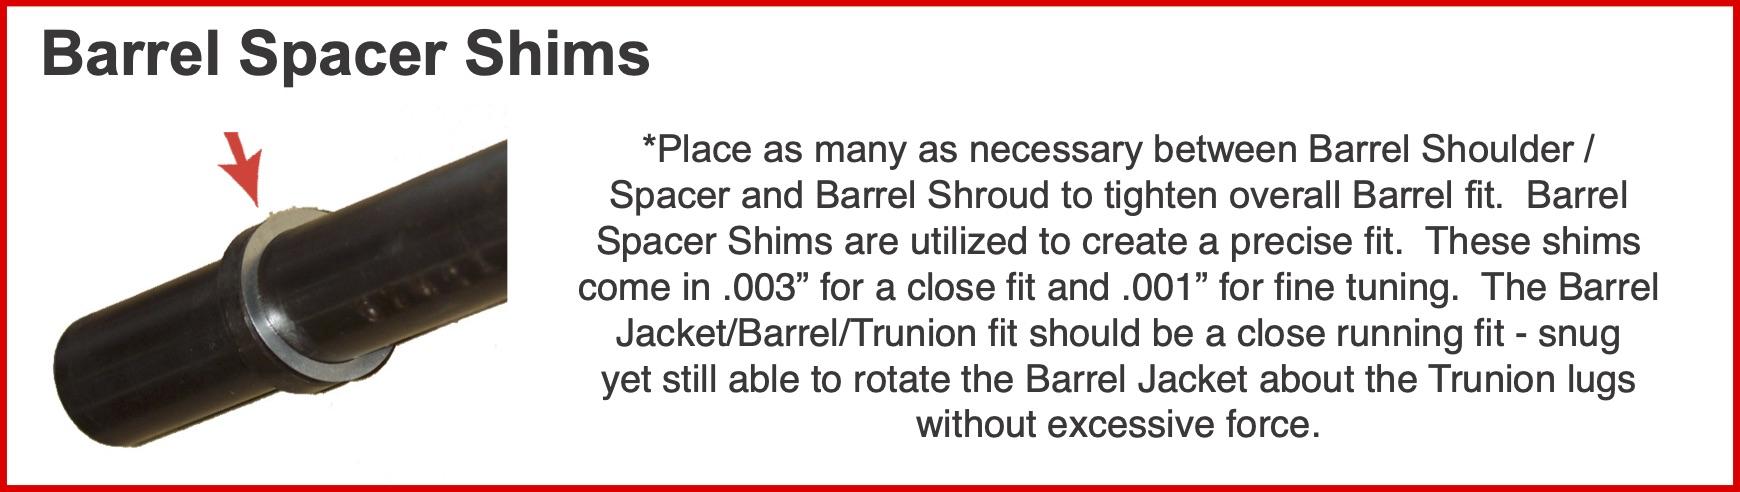 barrel-spacing-shims.jpg